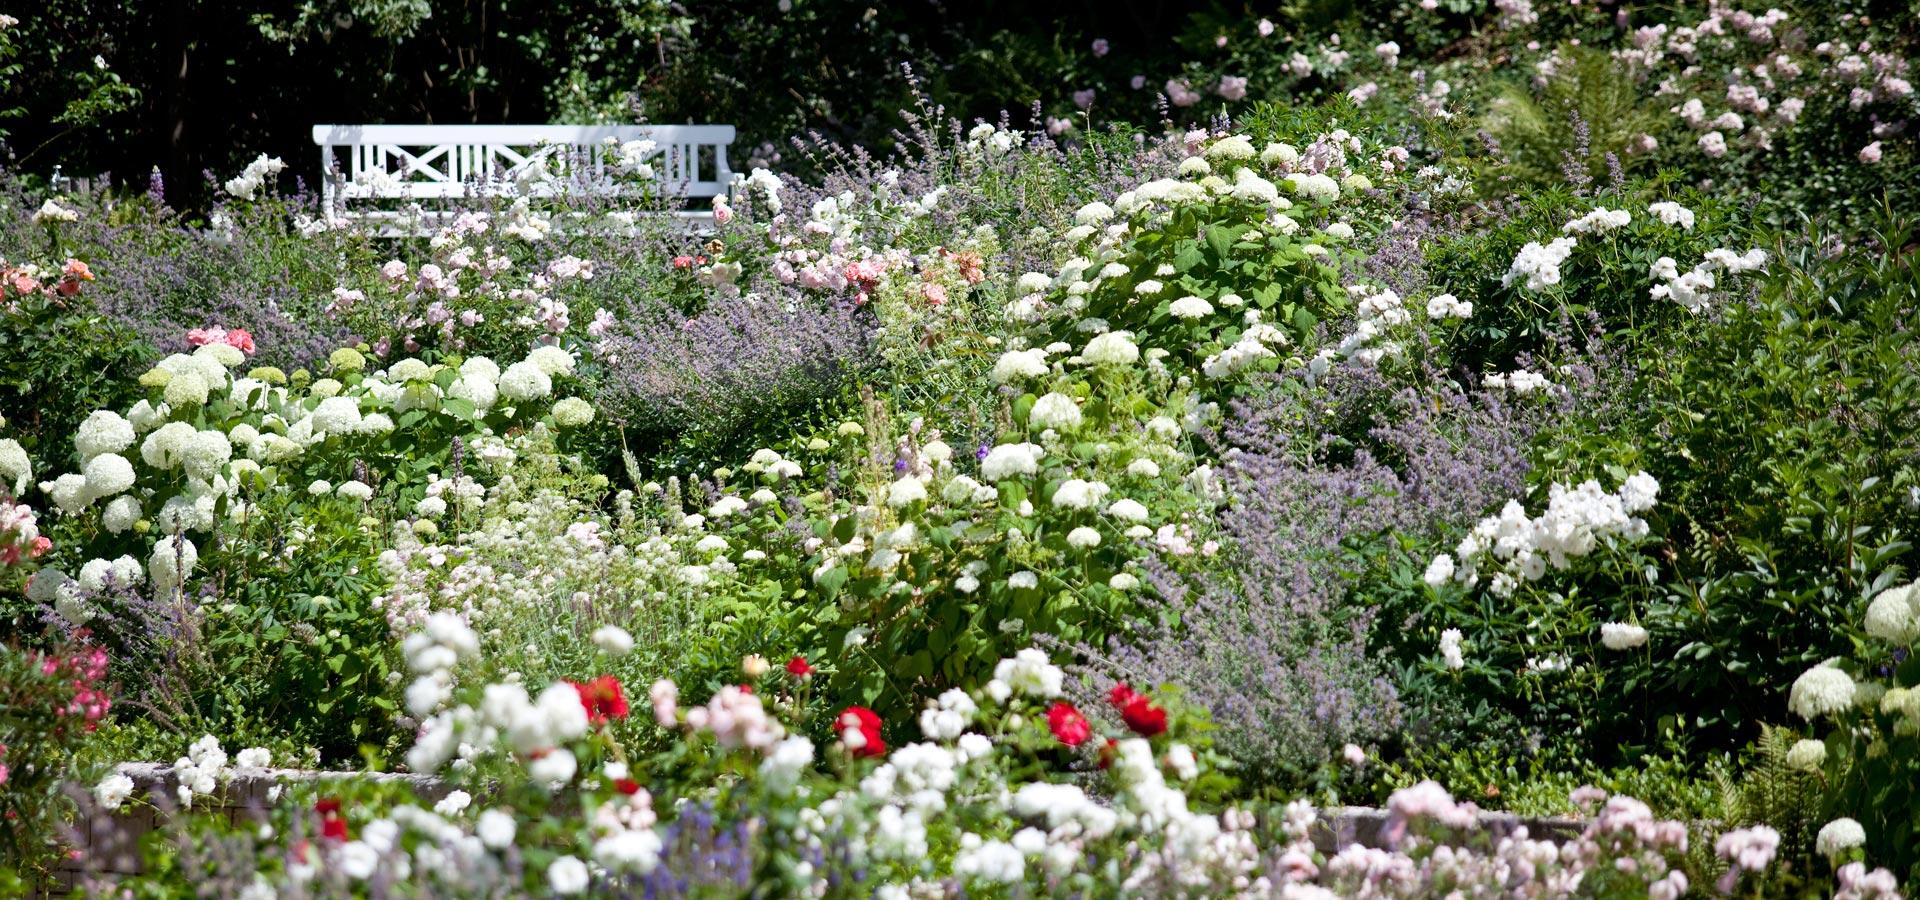 gartenhof k sters gmbh privatgarten wuppertal. Black Bedroom Furniture Sets. Home Design Ideas